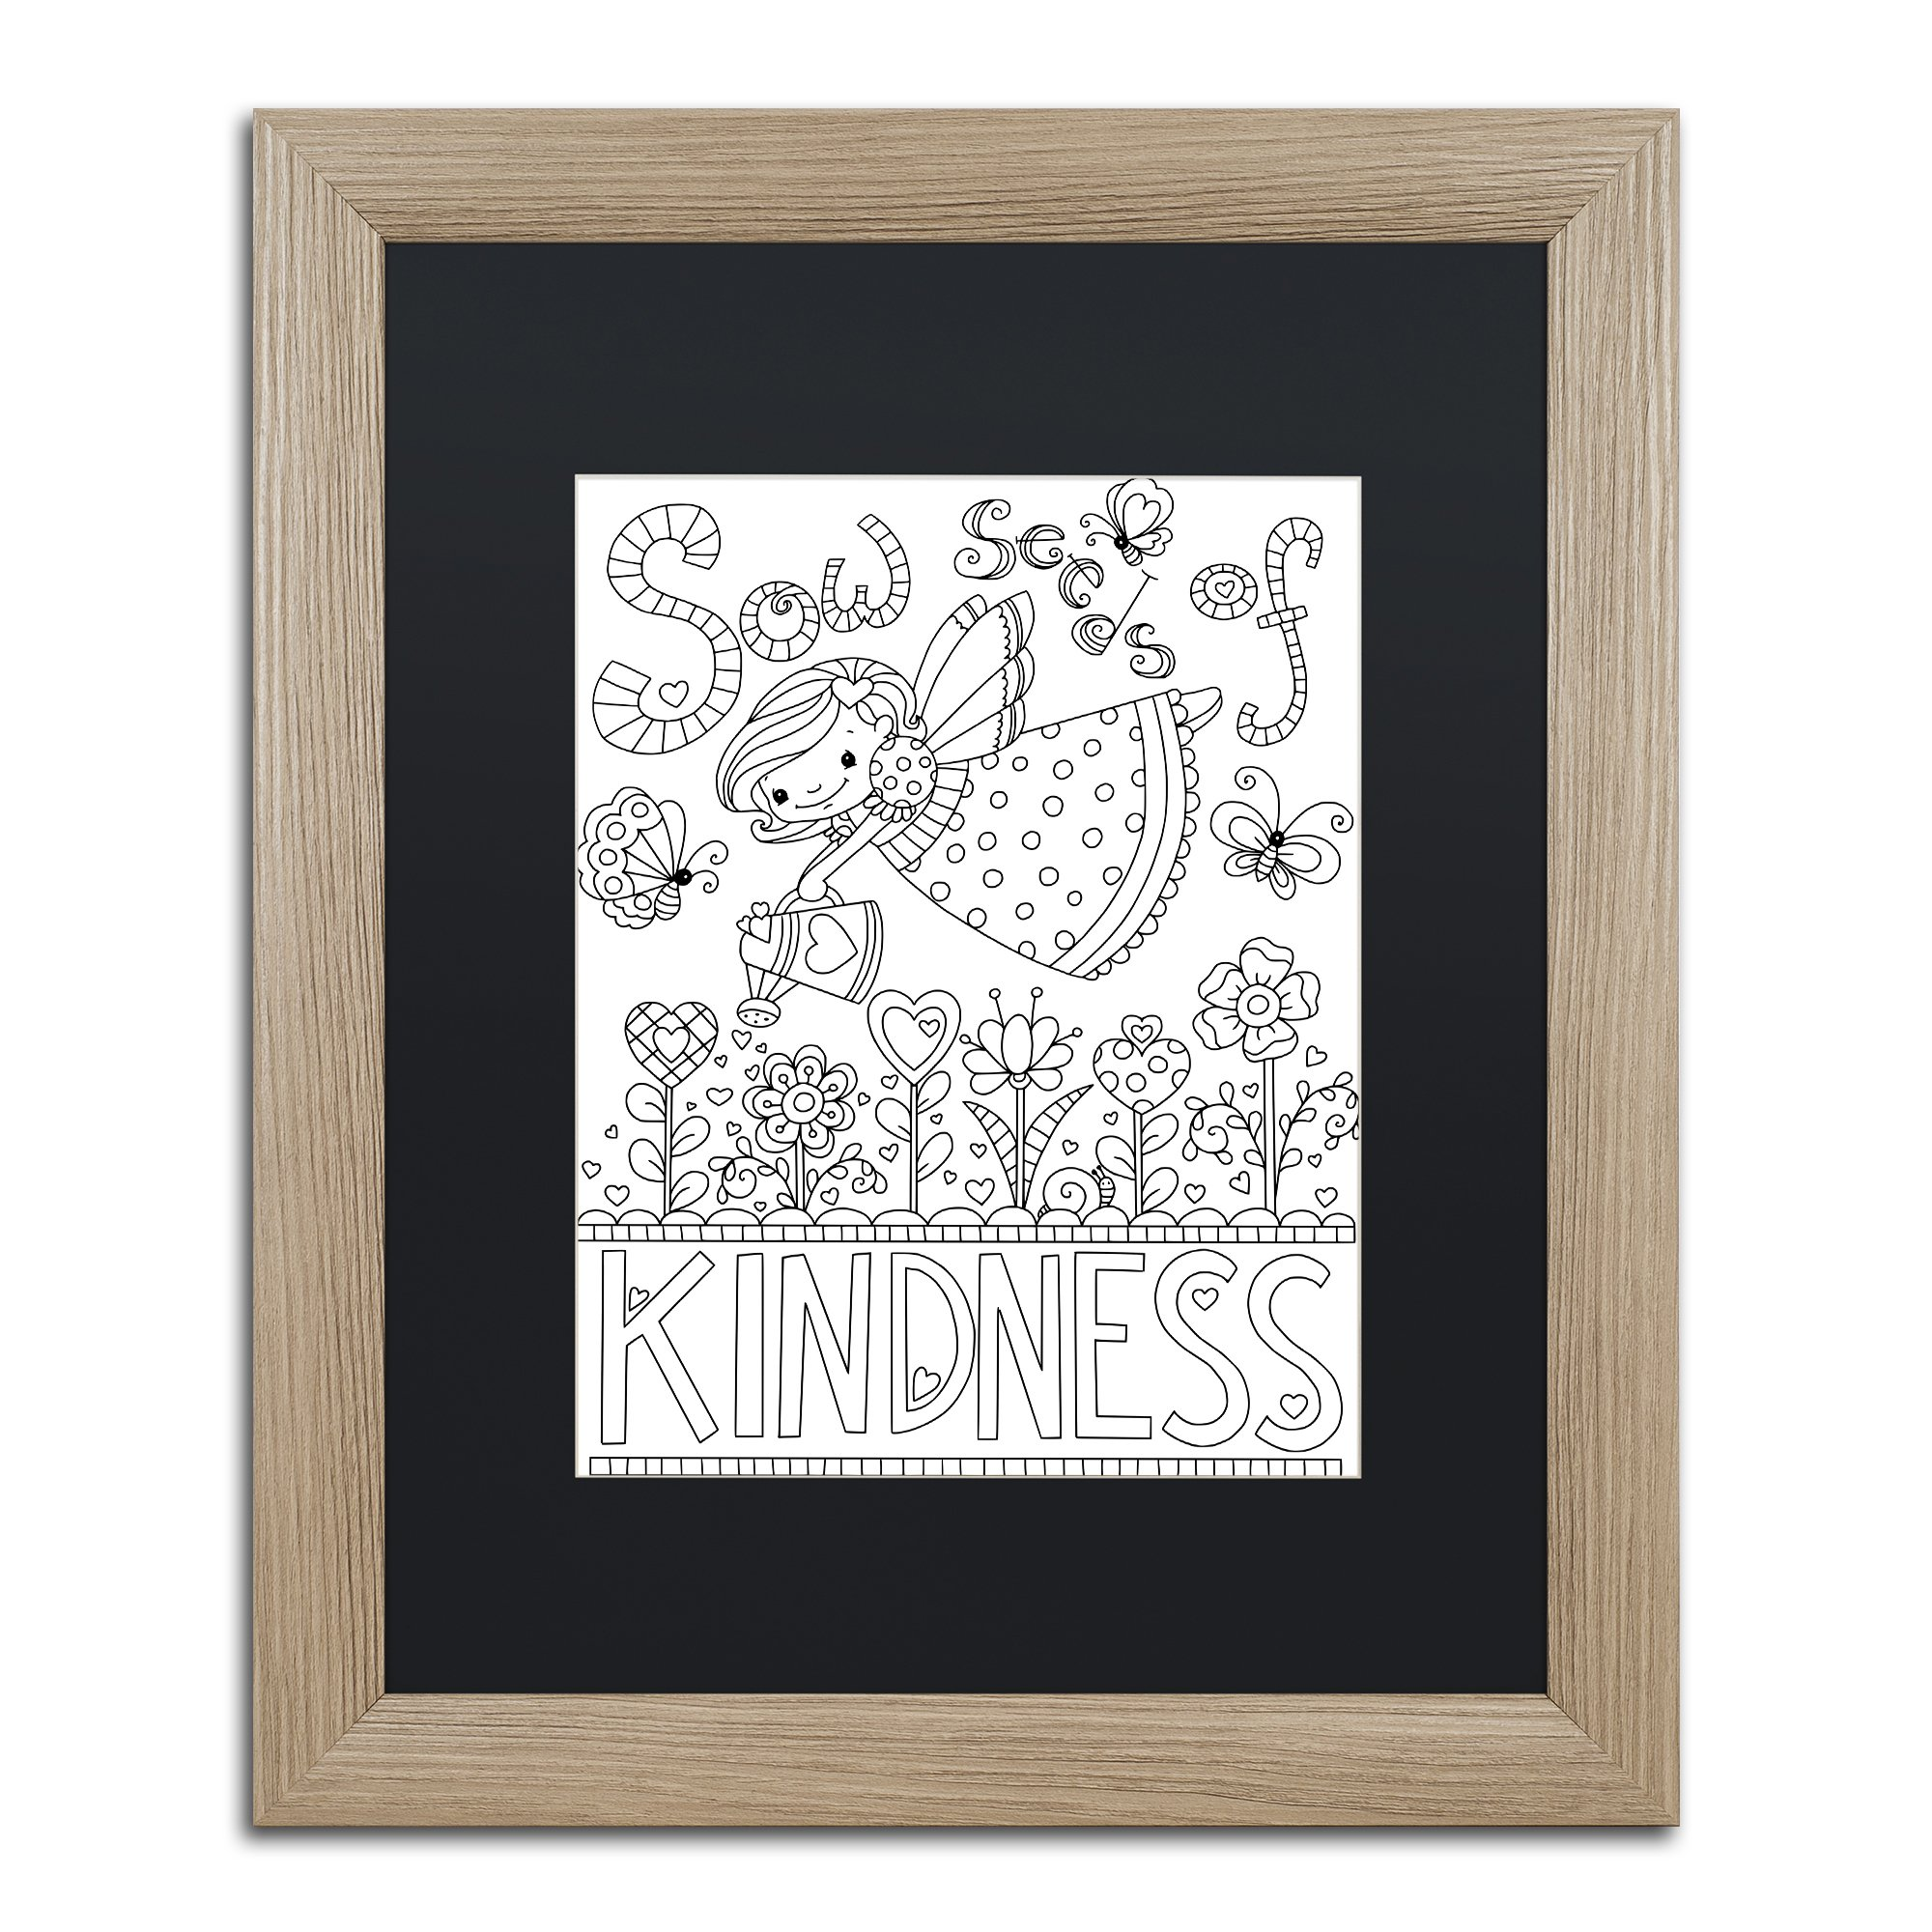 Sow Seeds by Jennifer Nilsson, Black Matte, Birch Frame 16x20-Inch by Trademark Fine Art